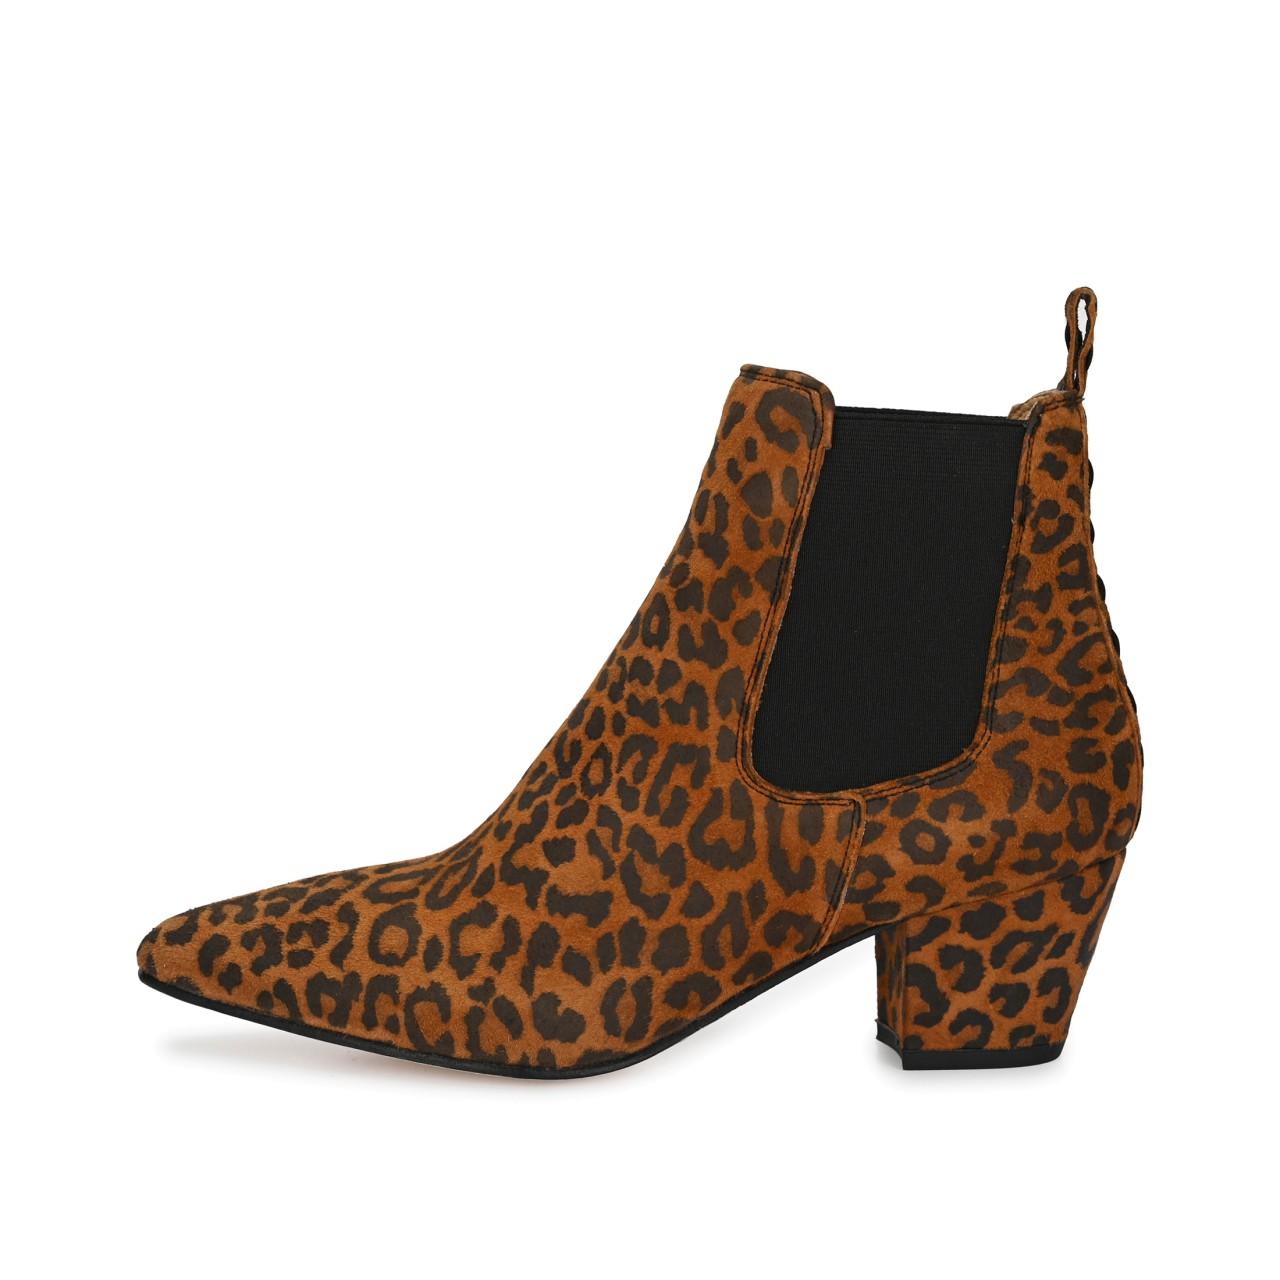 COLLIEN Suede Cognac mit Leopard